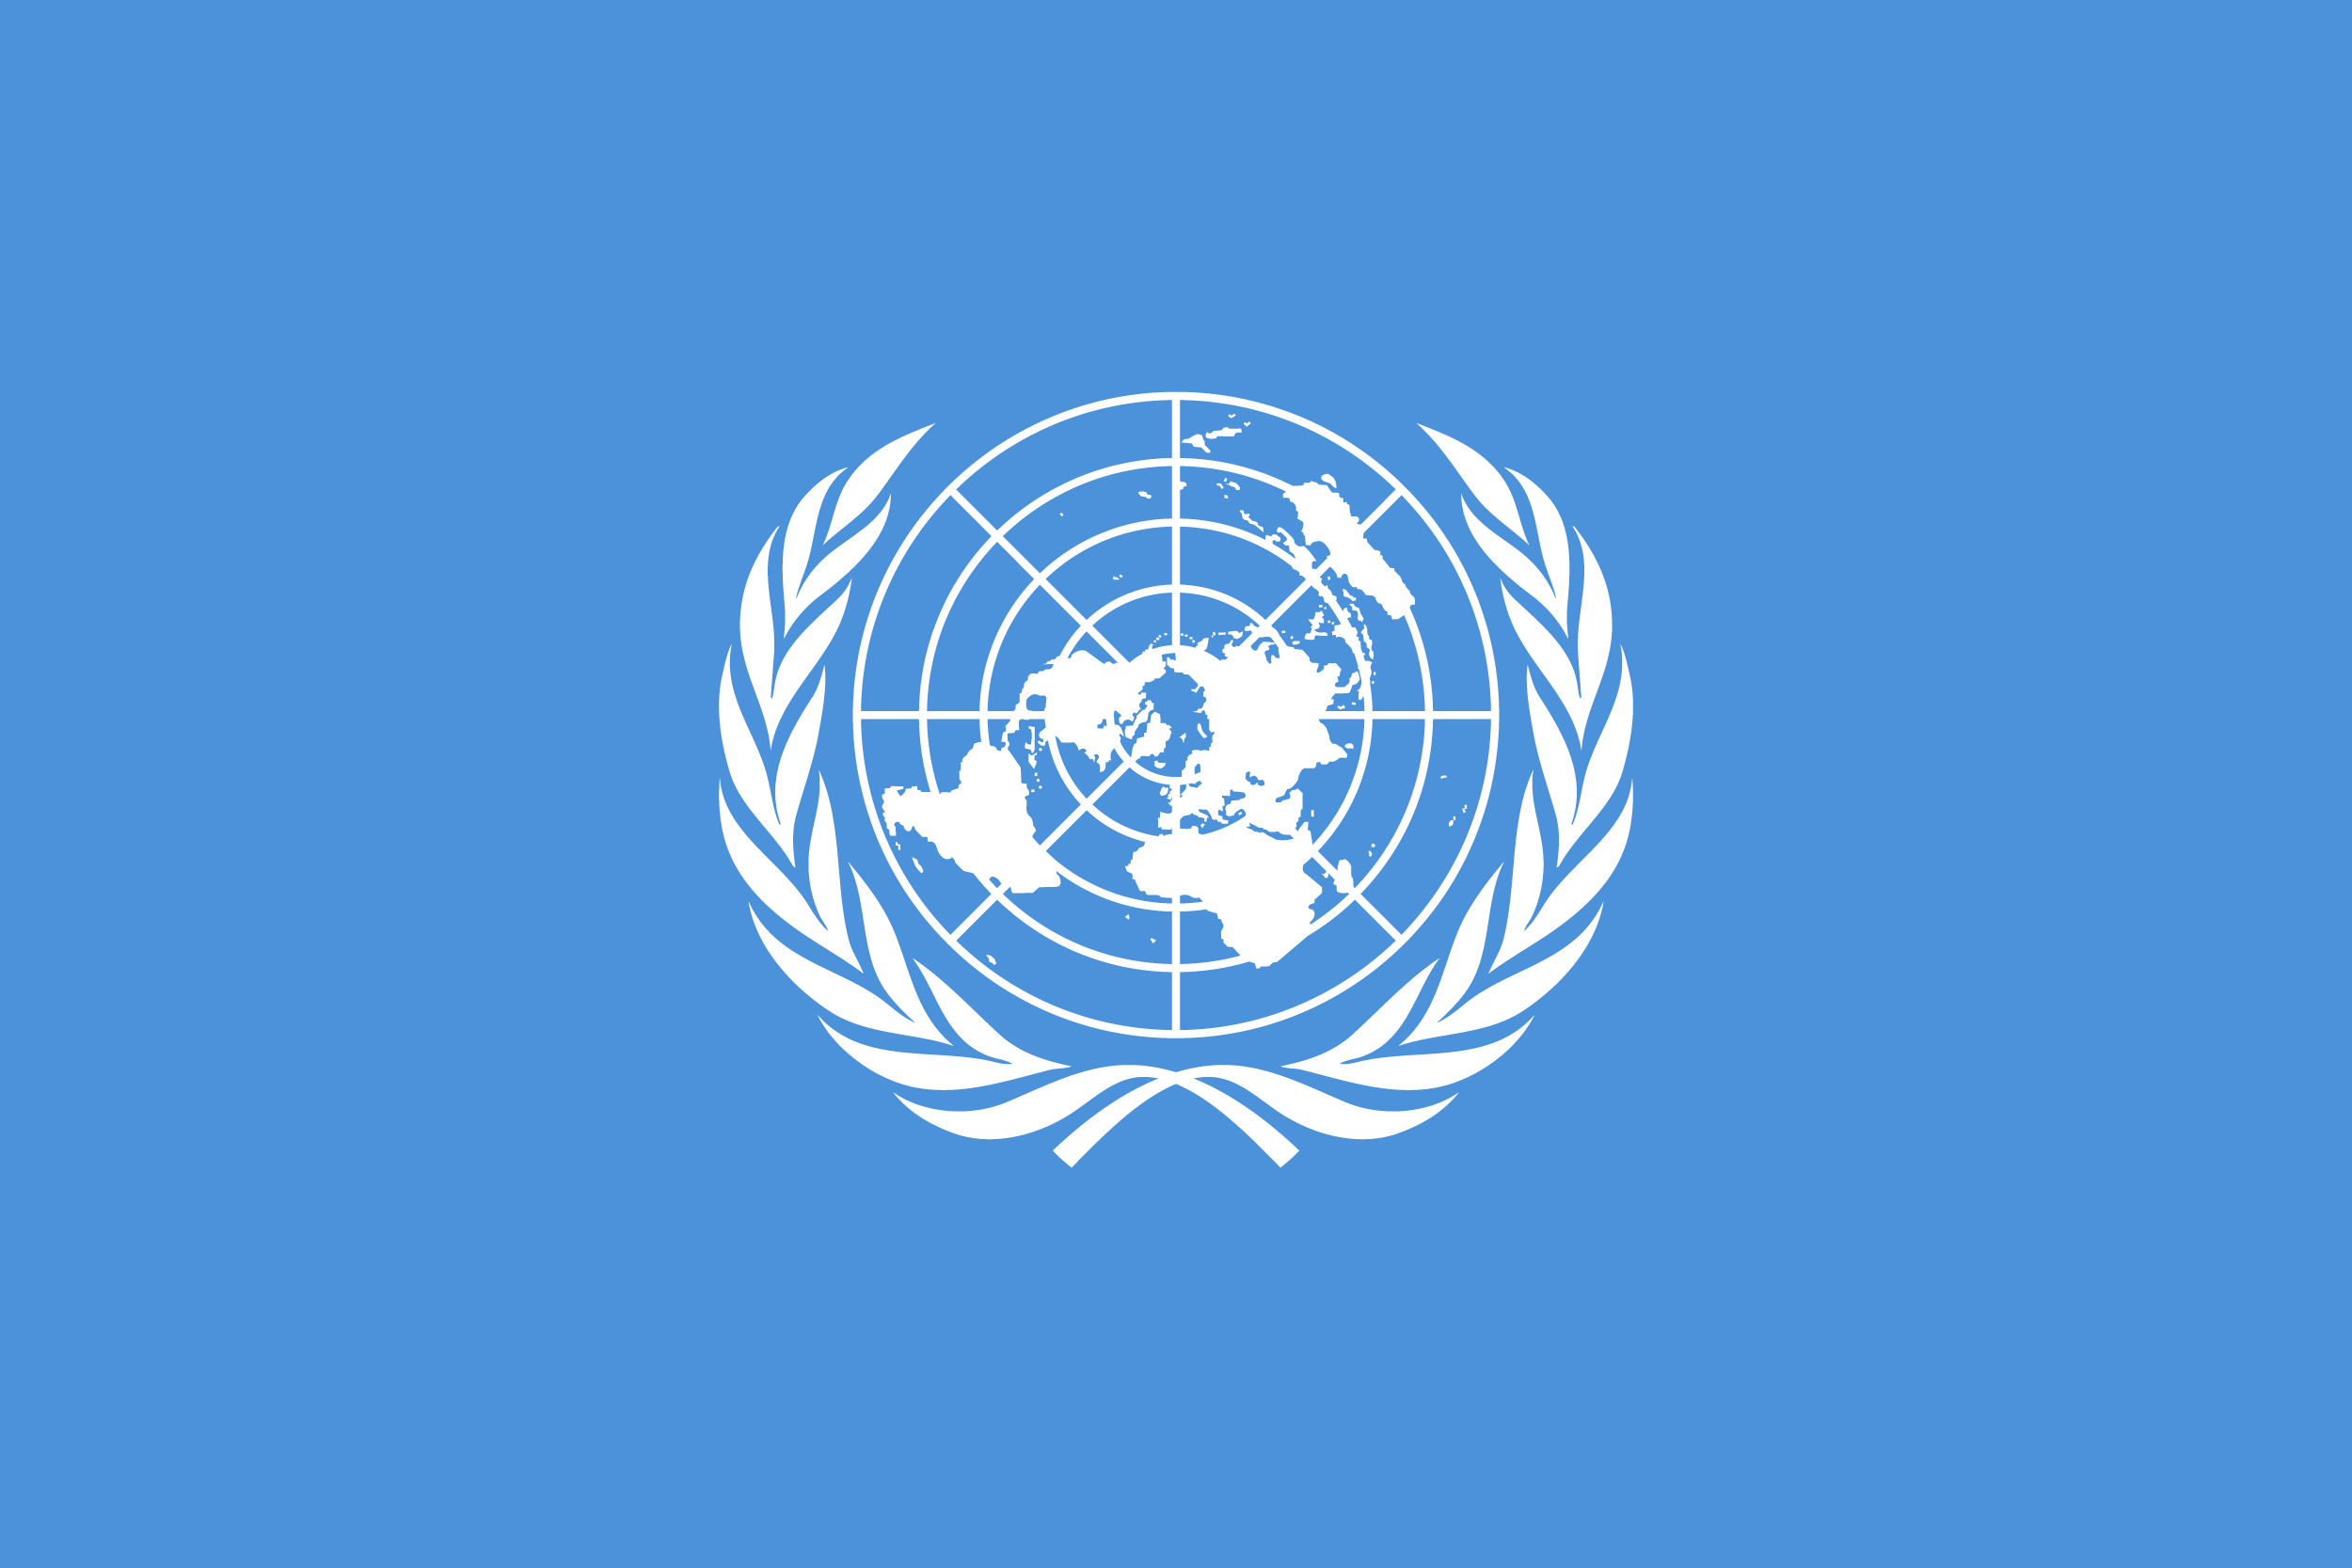 Флаг ООН (организации объединенных наций)